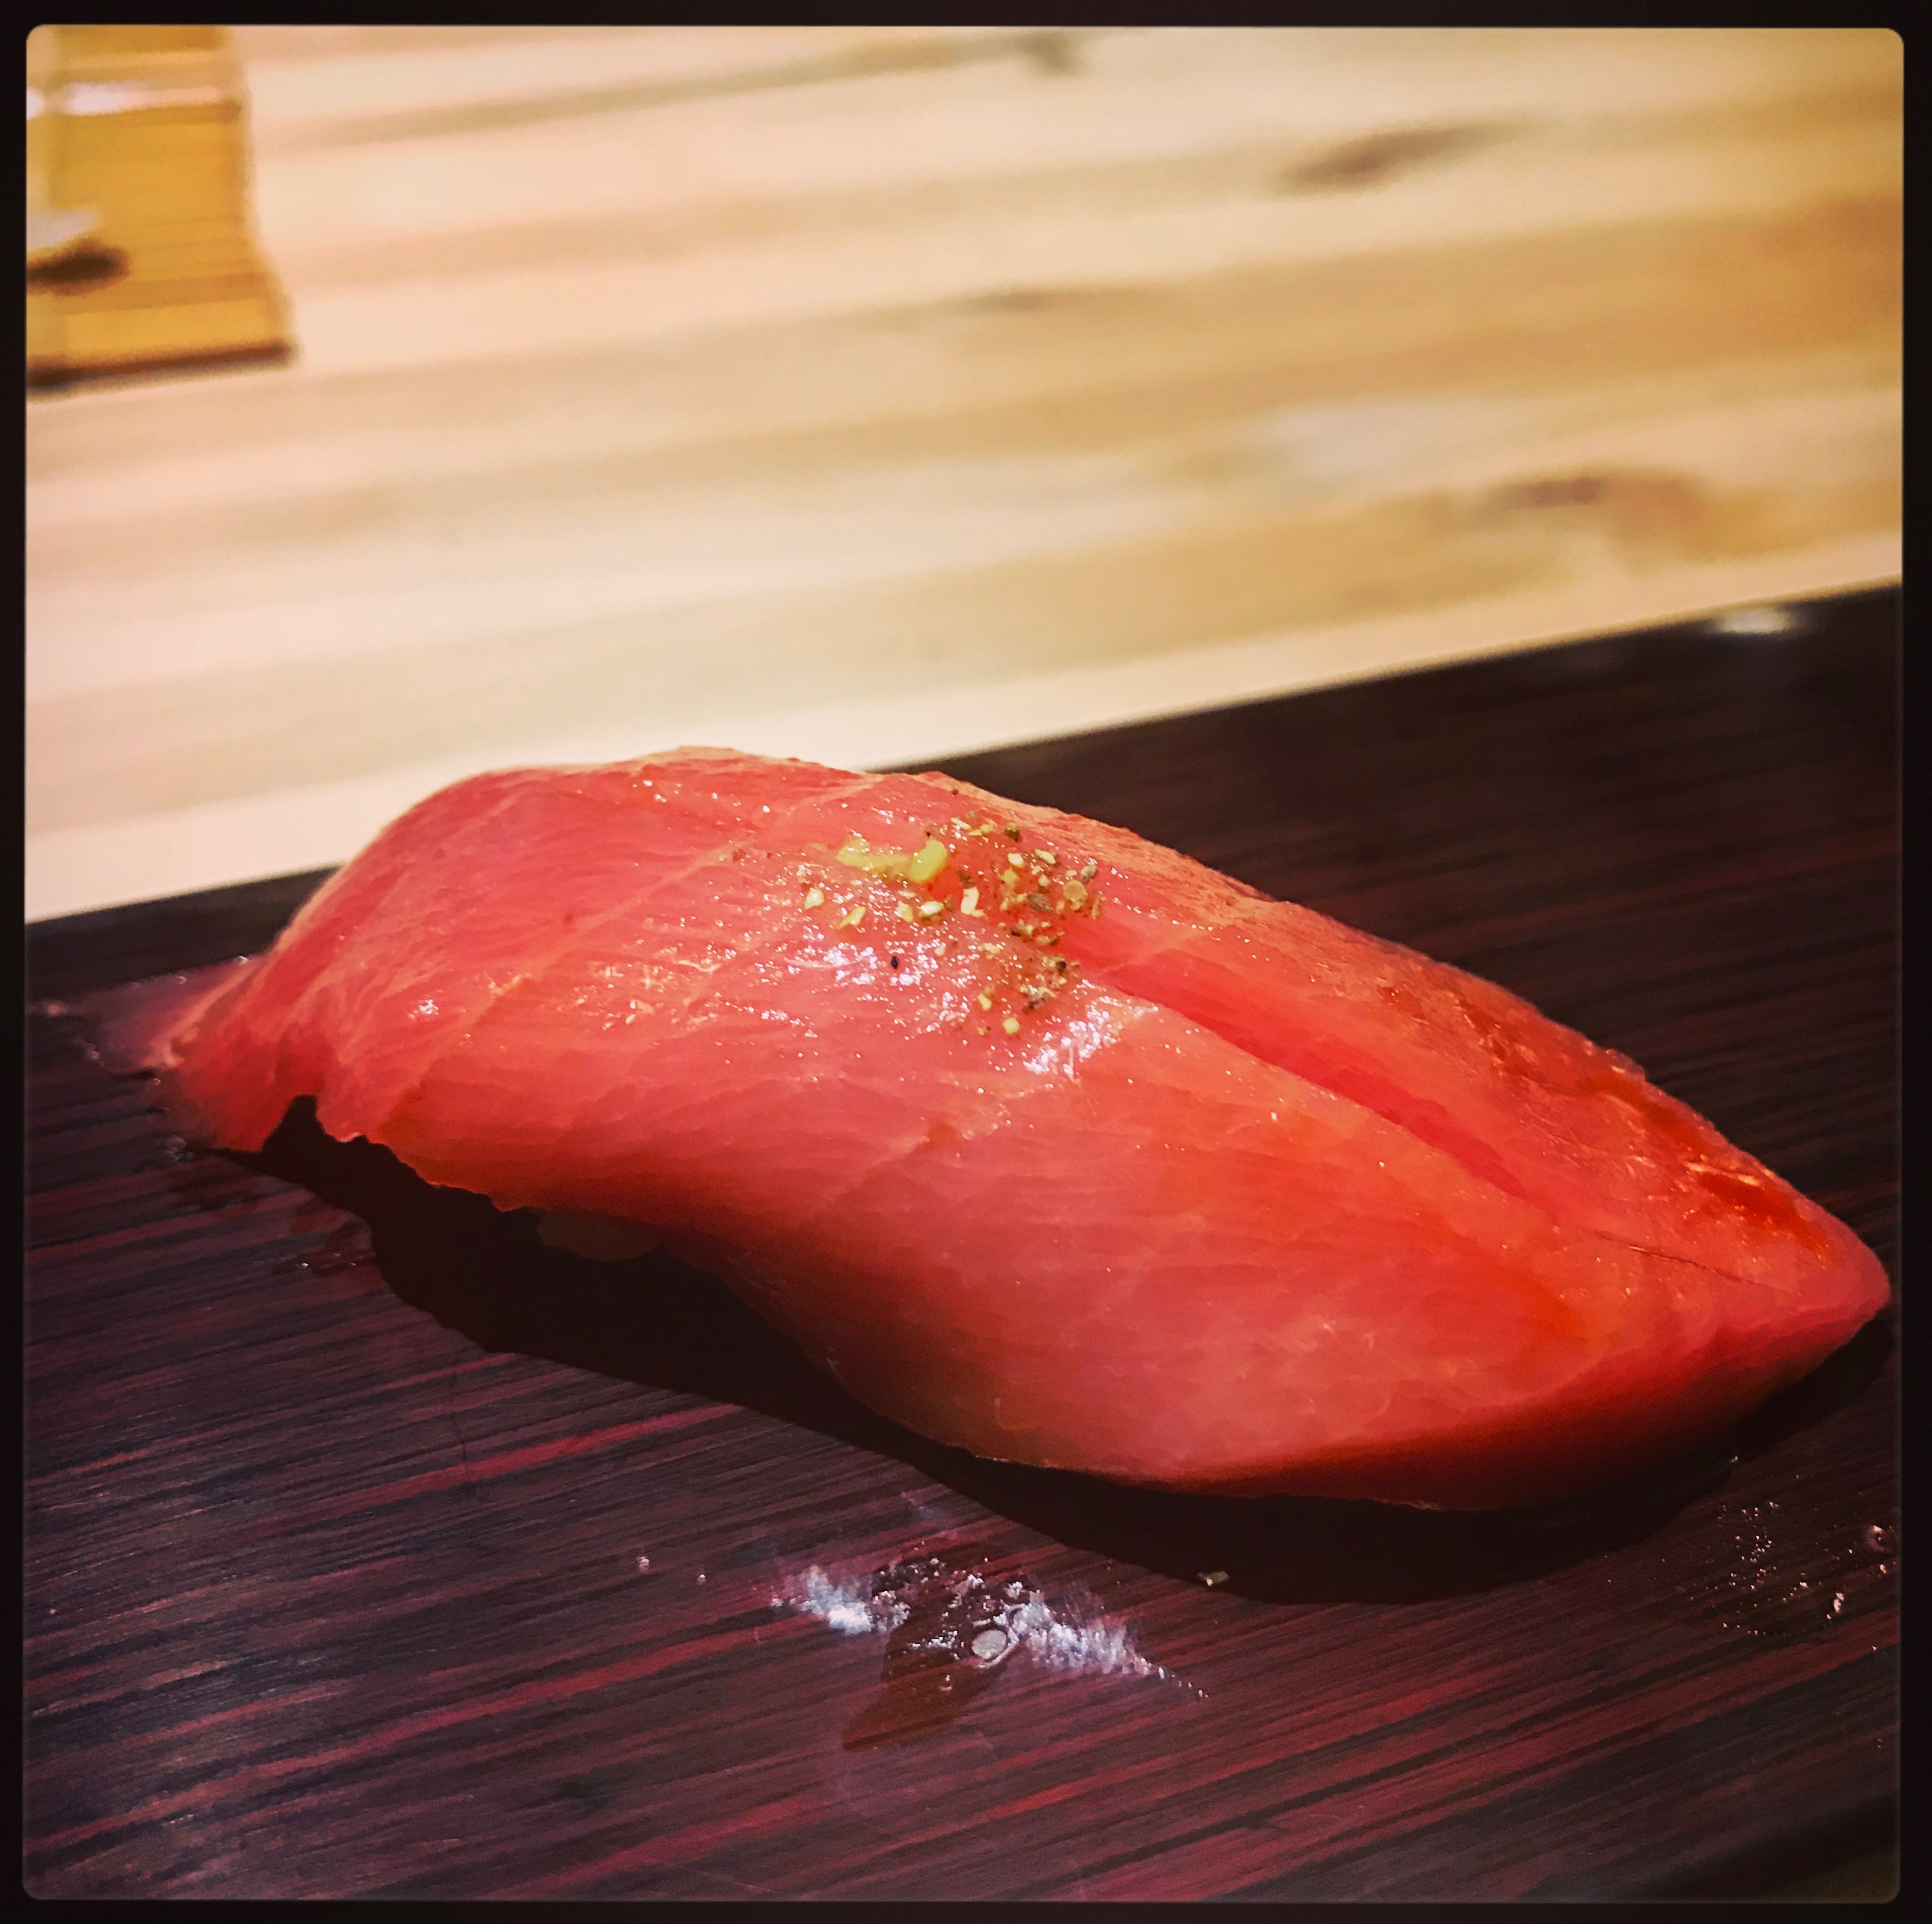 Sushi Ran - omakase - chu toro medium fatty kindai-tenku blue fin tuna nigiri